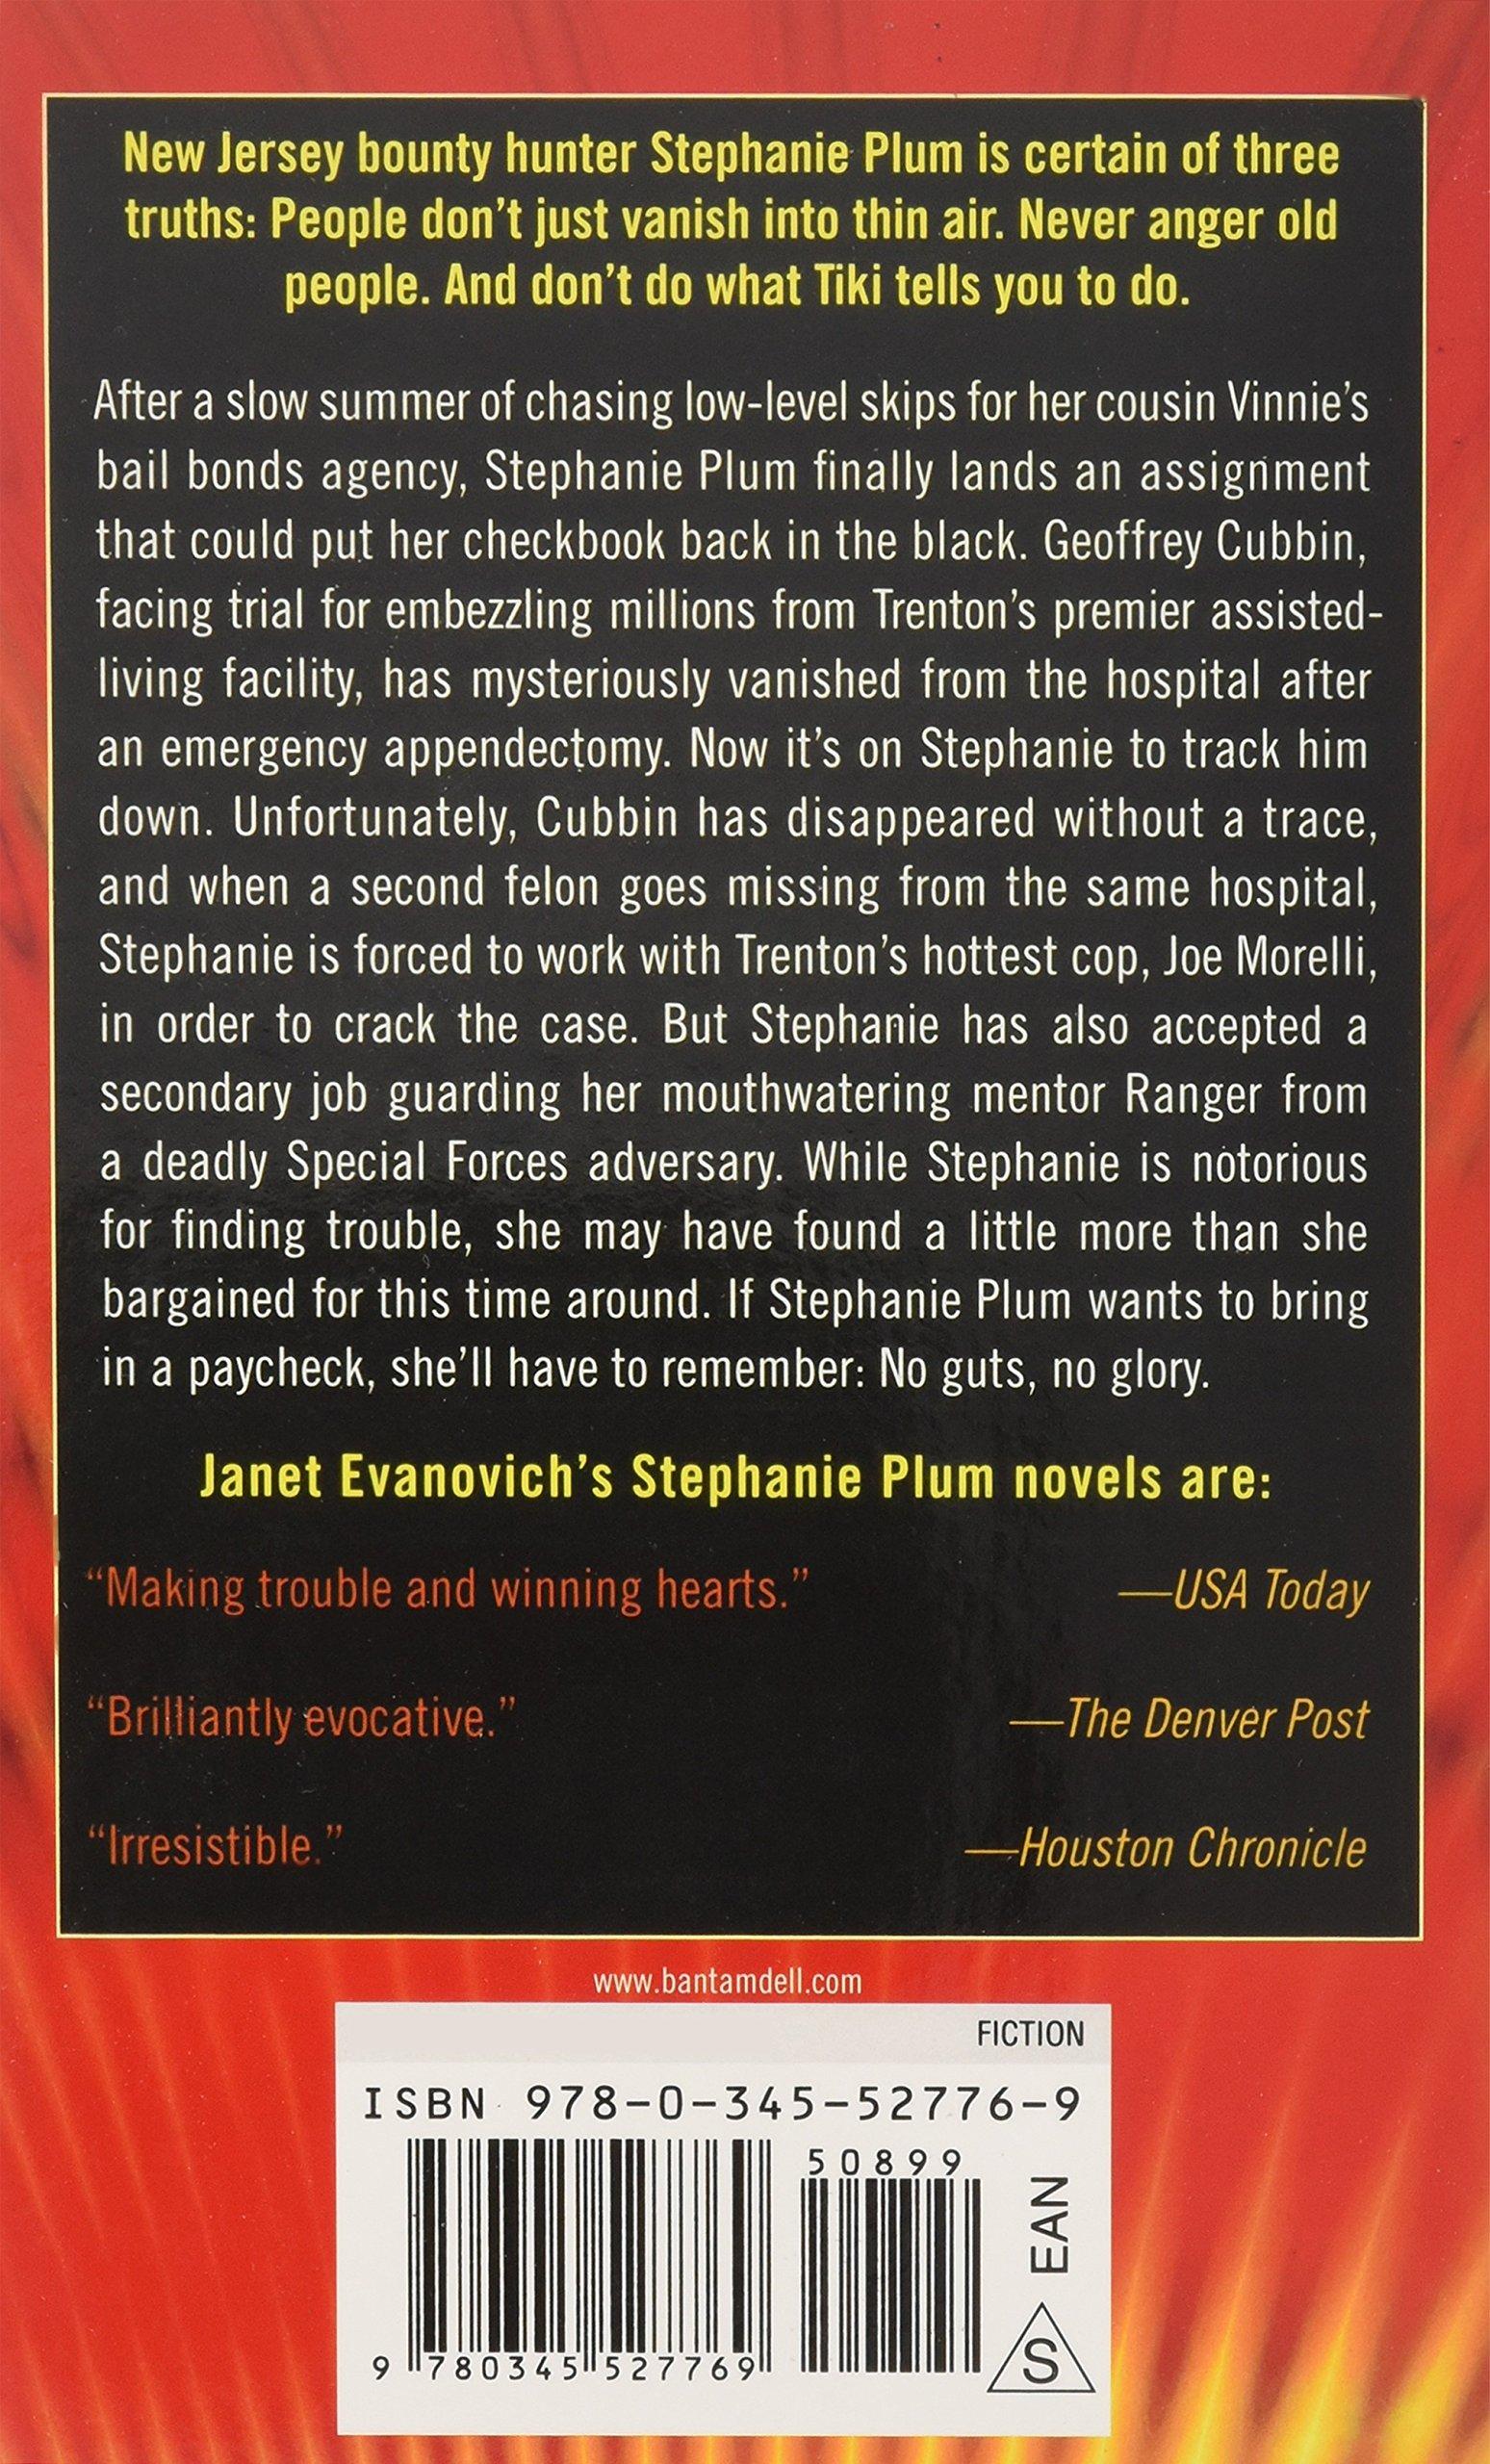 Notorious Nineteen A Stephanie Plum Novel Janet Evanovich 9780345527769 Books